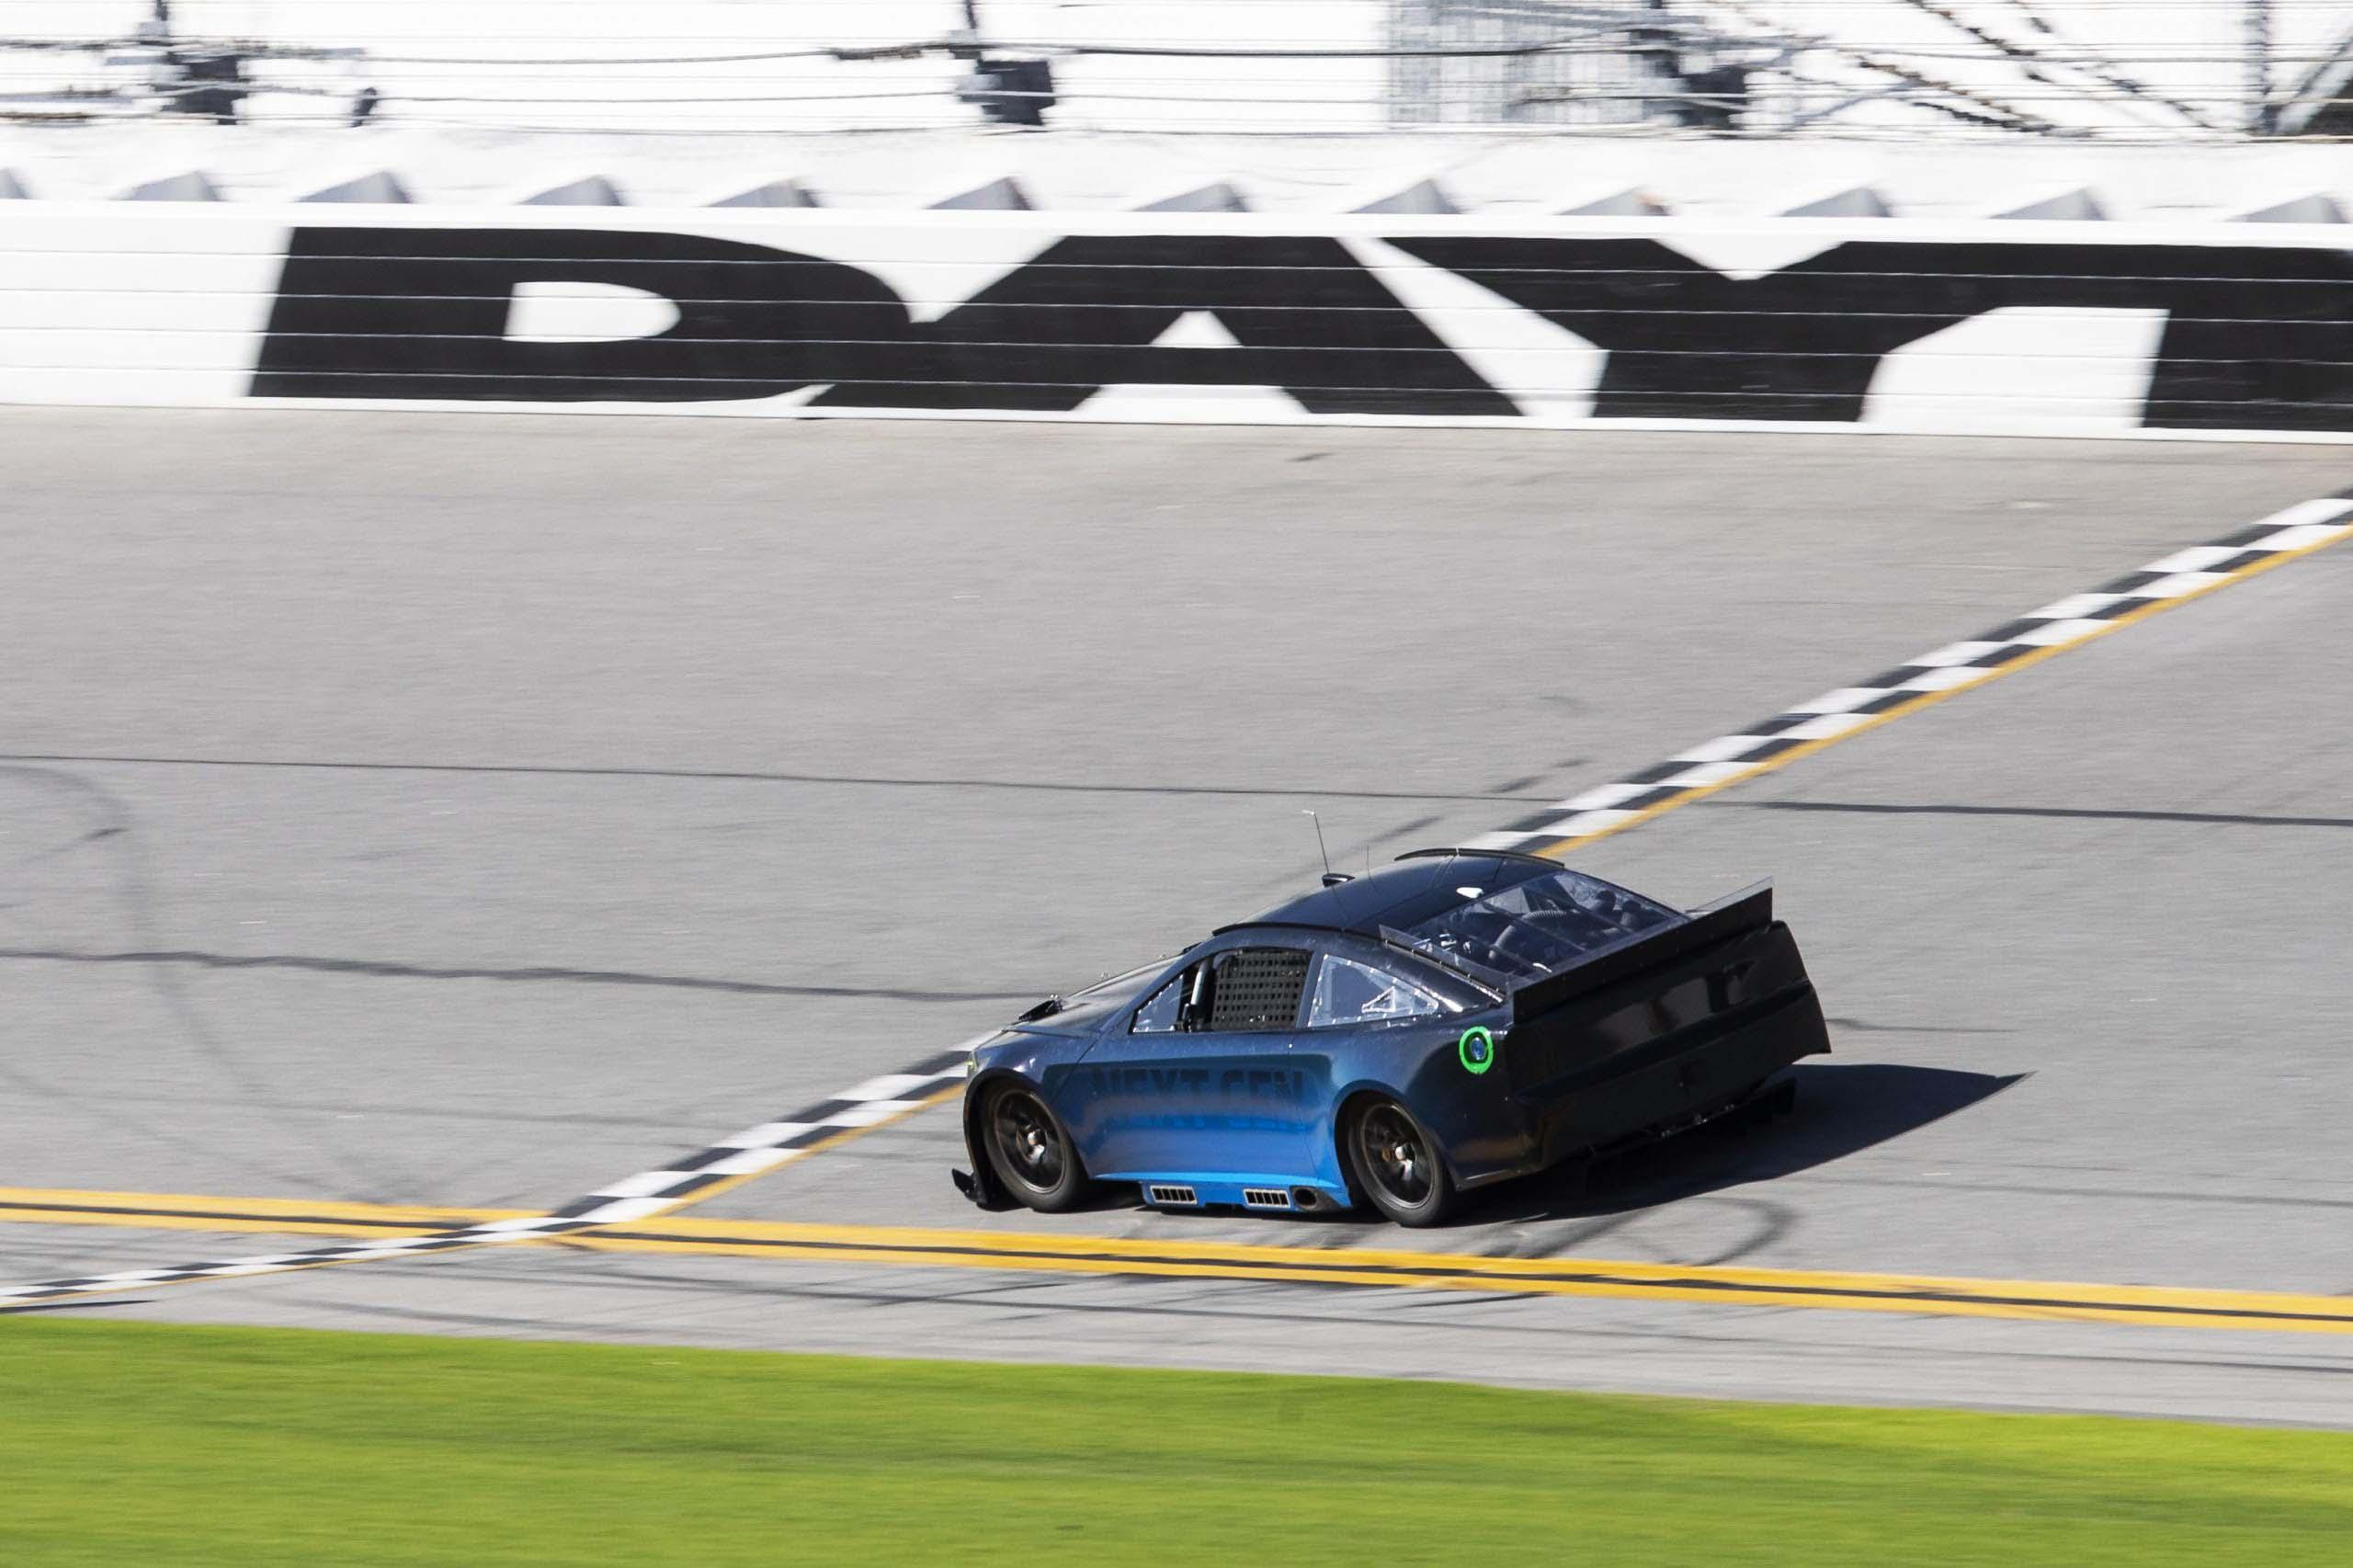 Superspeedway test for NASCAR Next Gen car